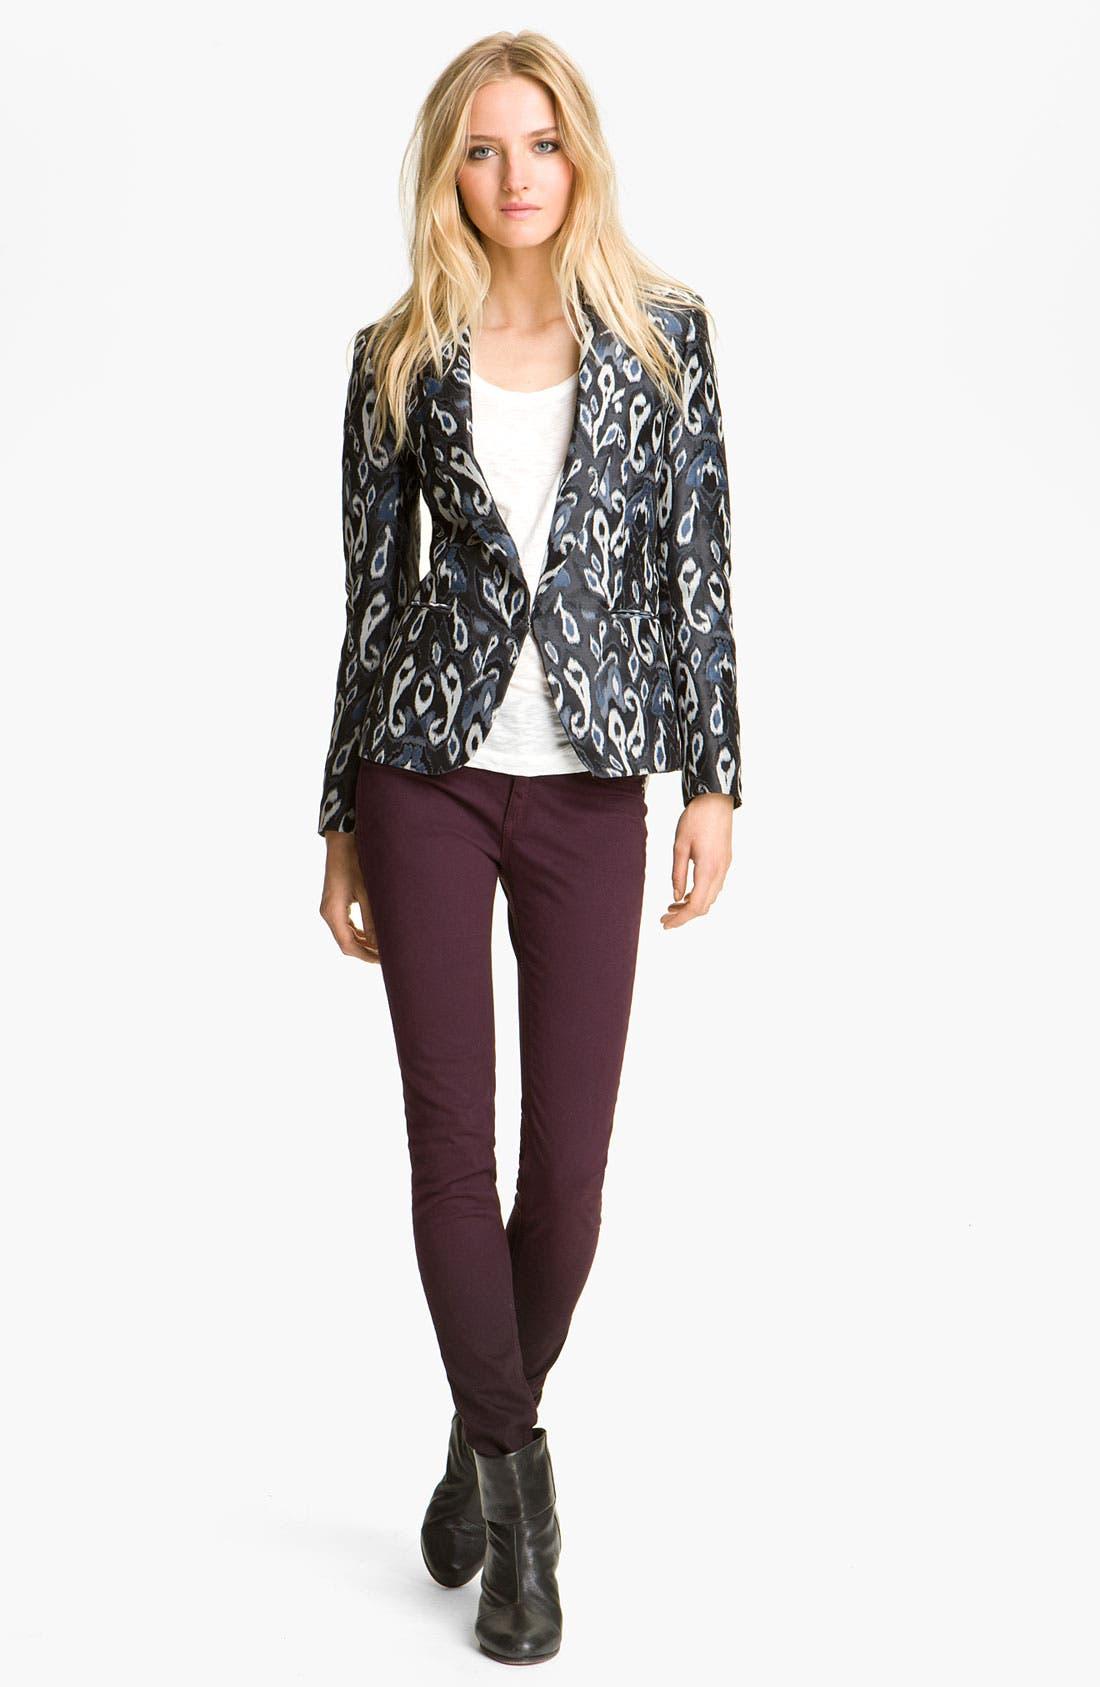 Main Image - rag & bone Ikat Print Tuxedo Jacket